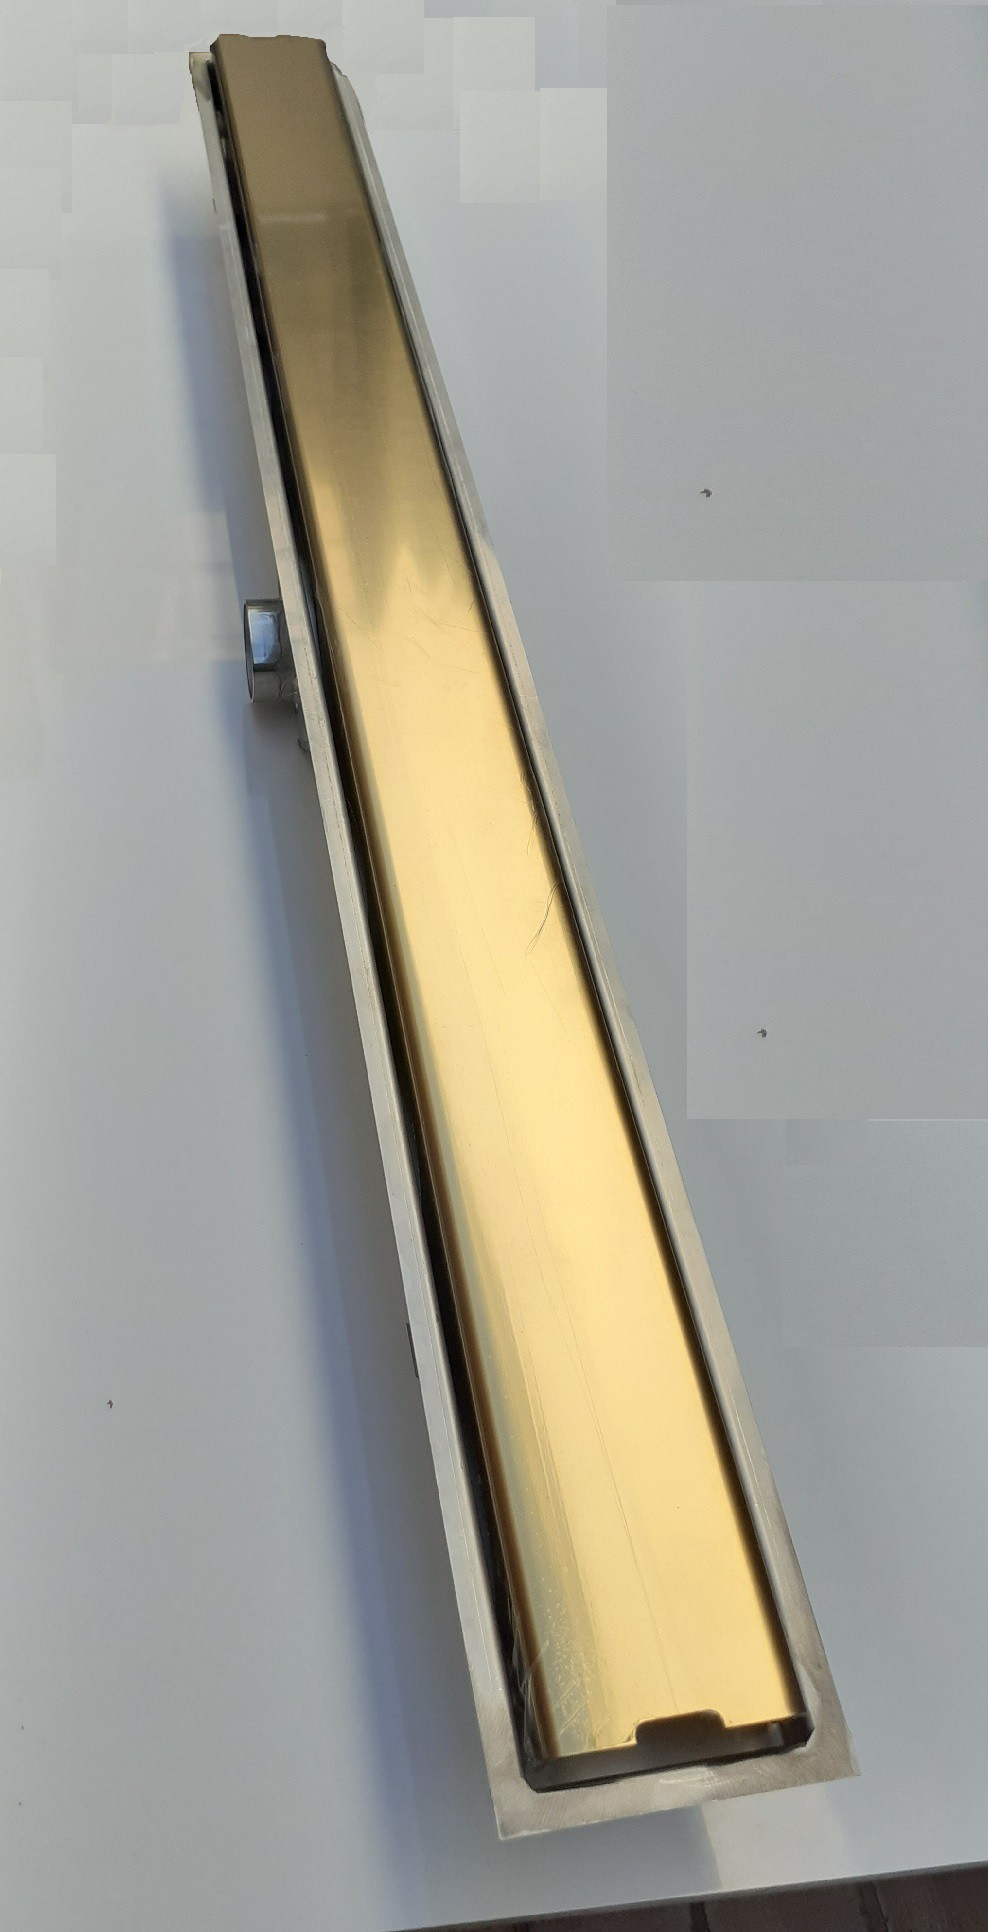 Ralo Linear Sifonado Inox Eletrocolorido Ouro Polido 80cm